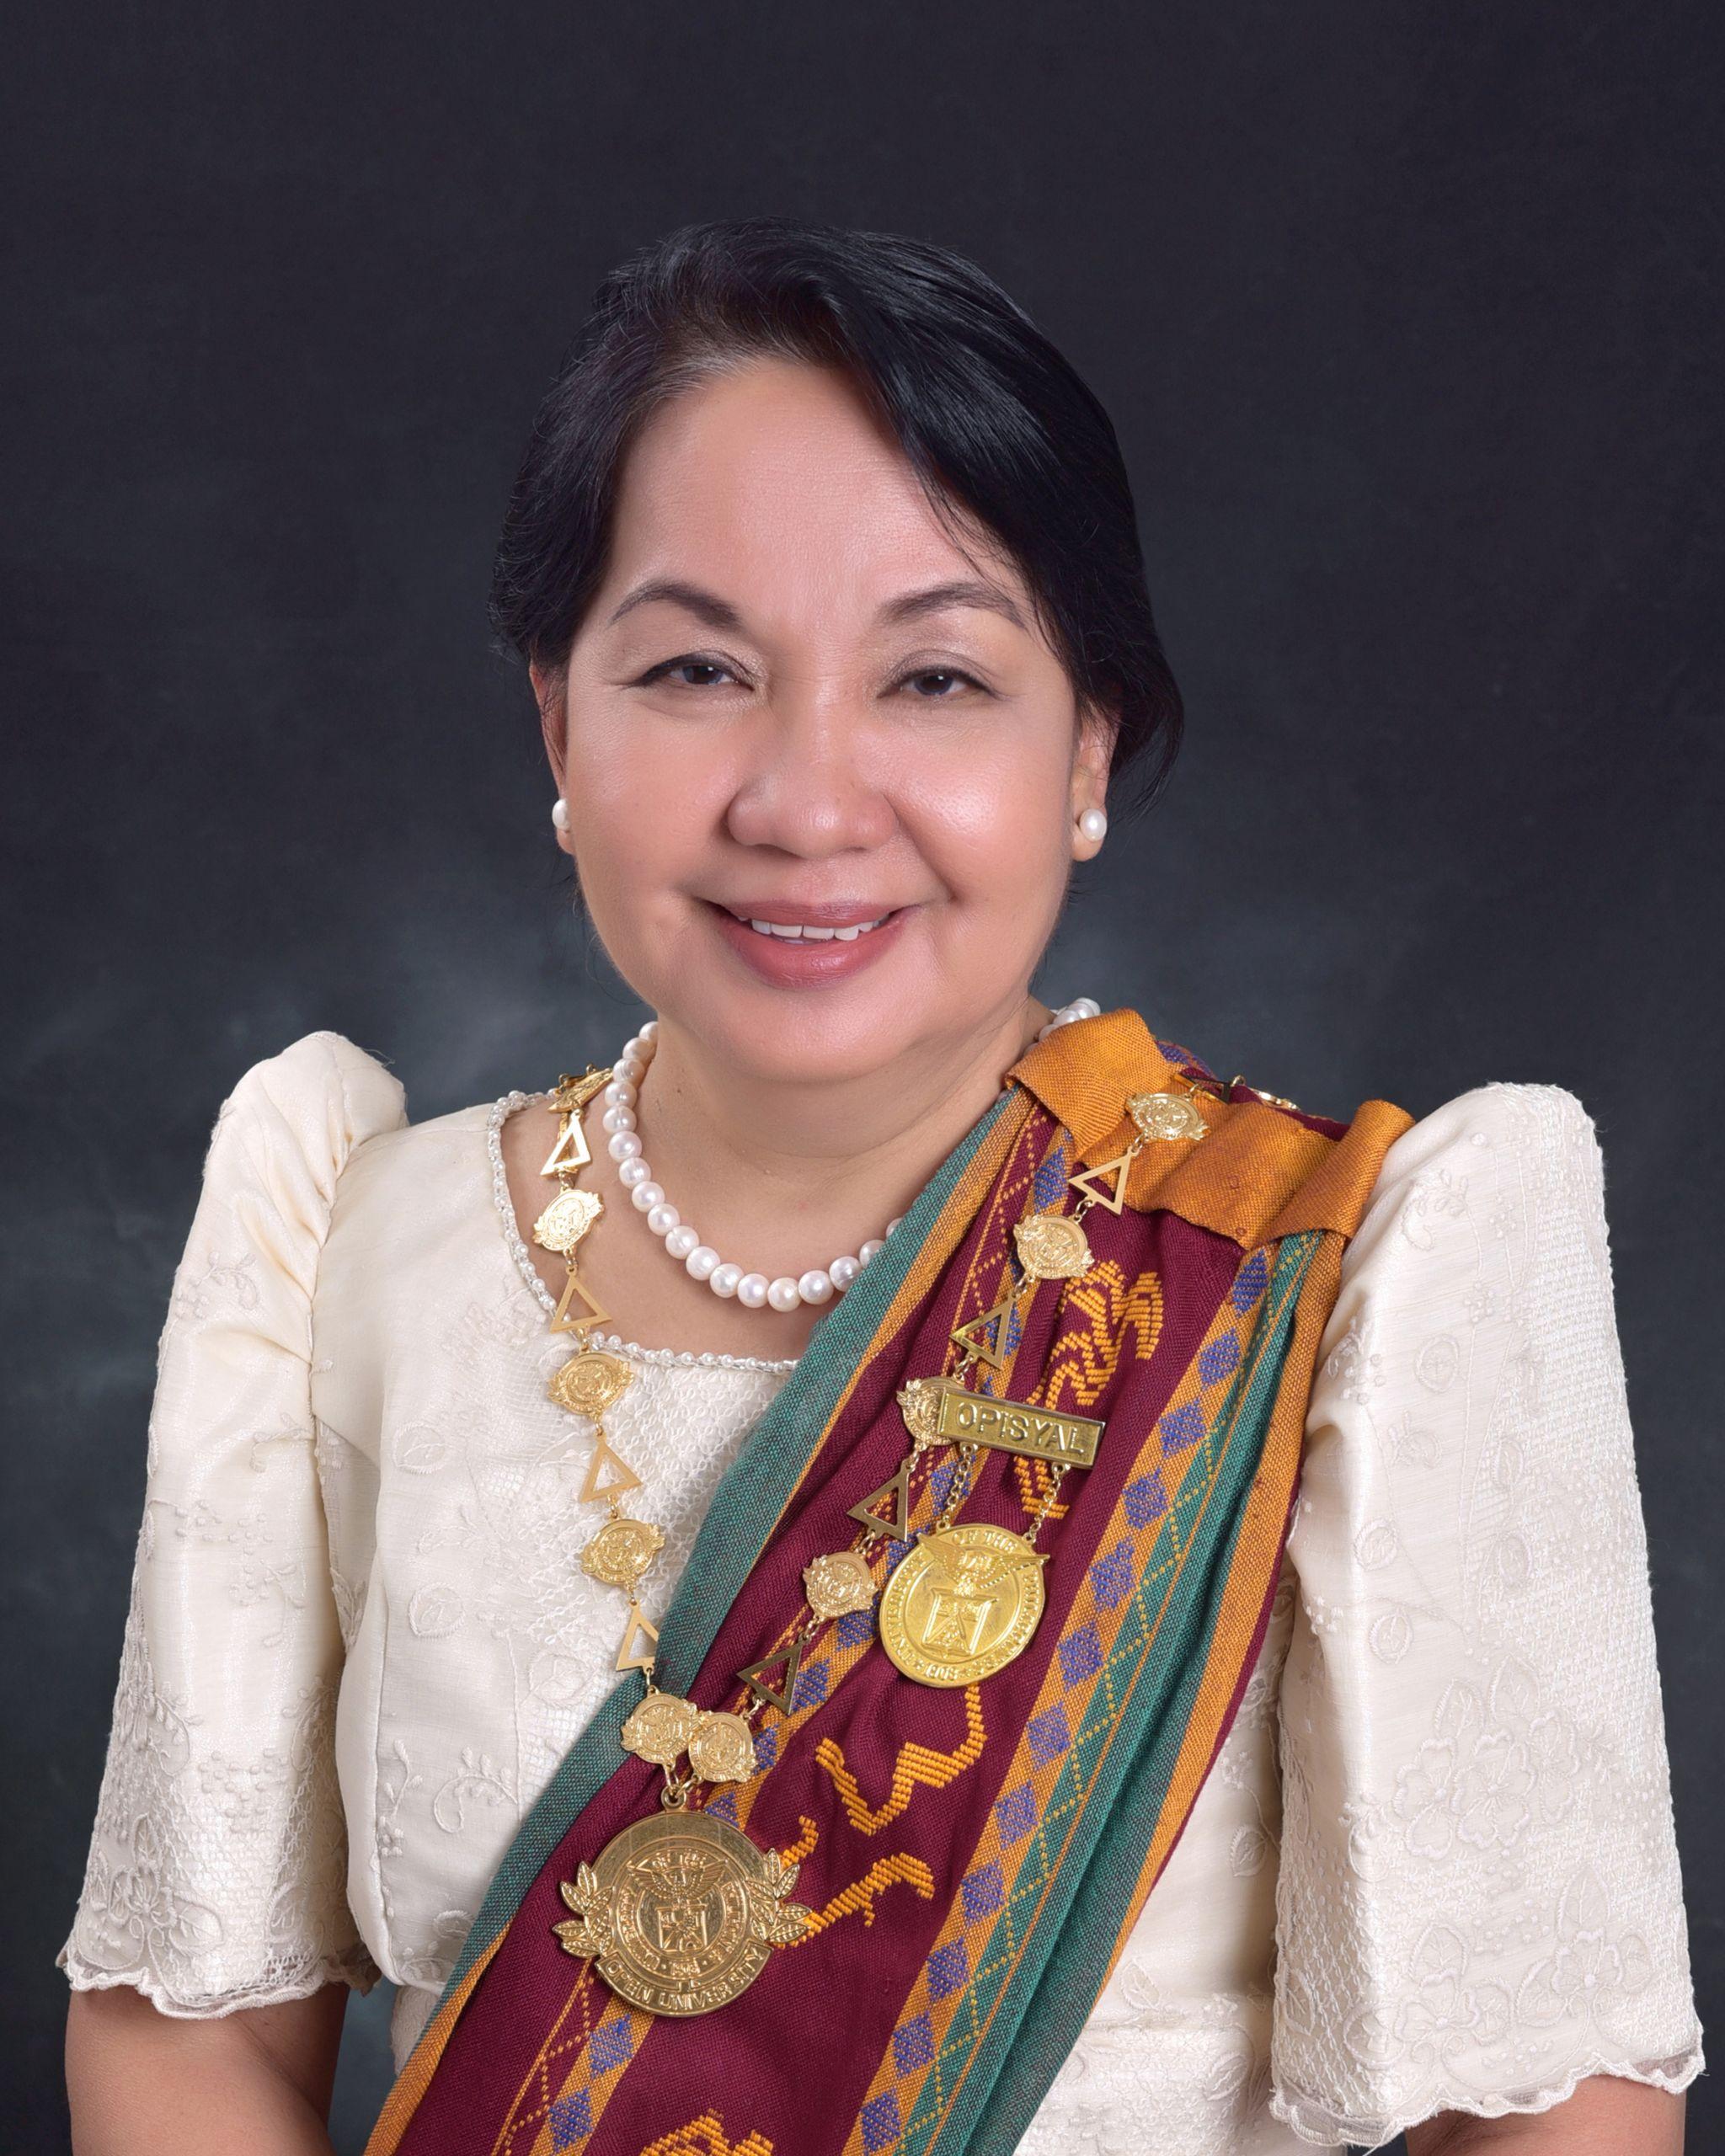 Chancellor Melinda dela Peña Bandalaria